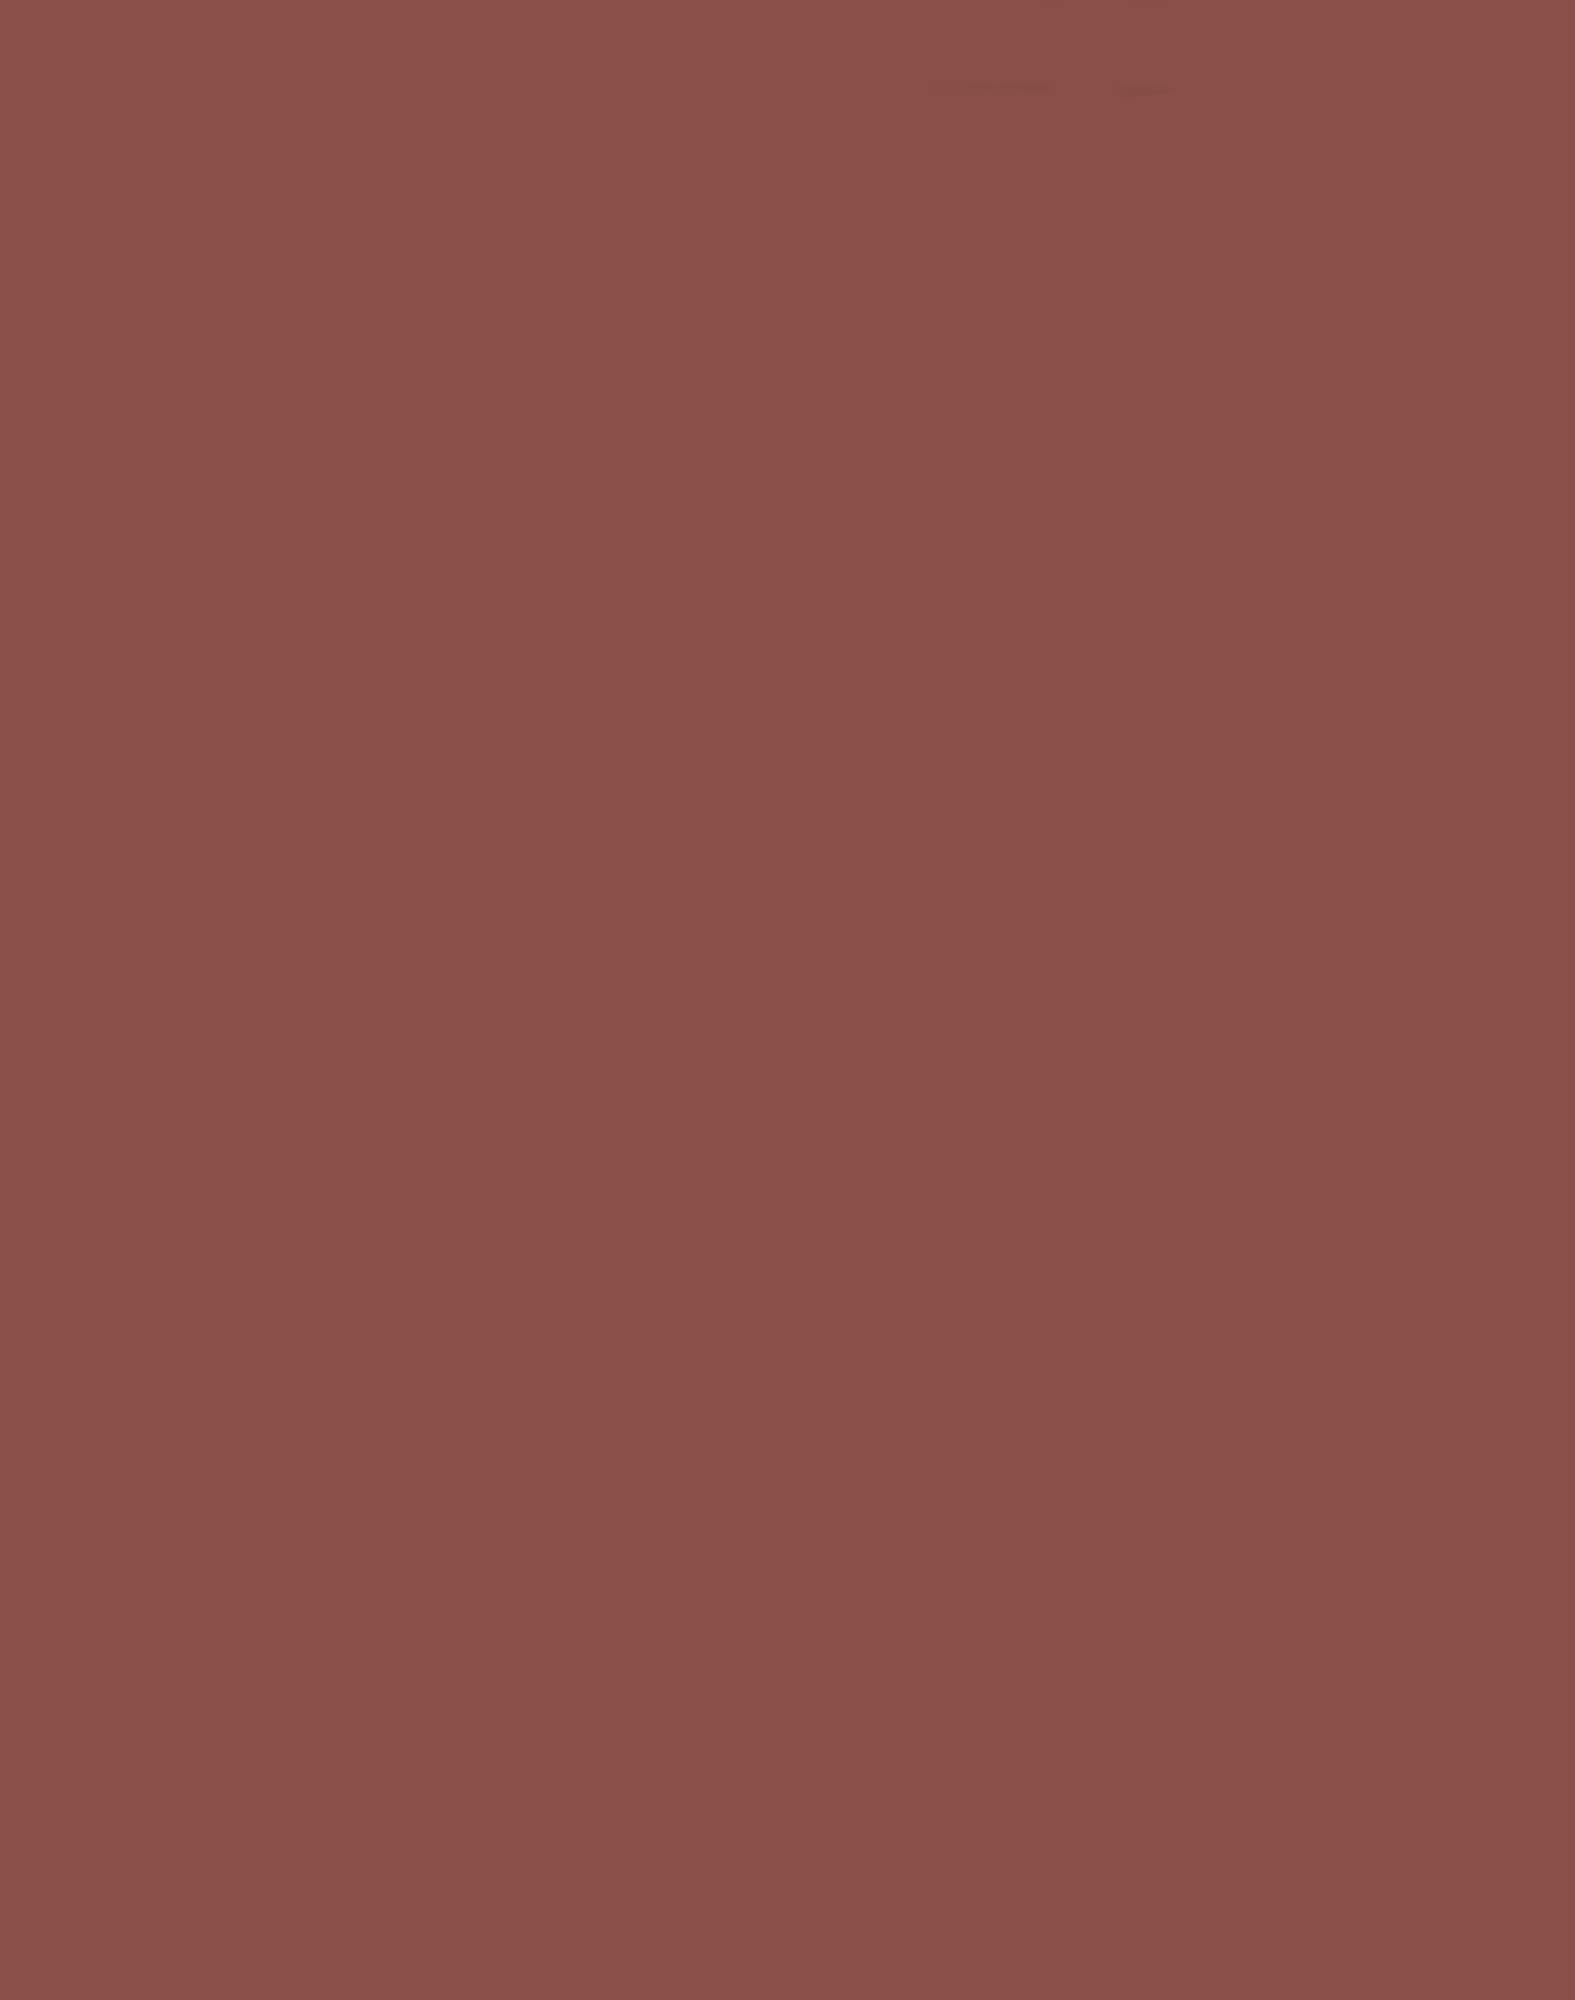 Brick Red 138,79,72